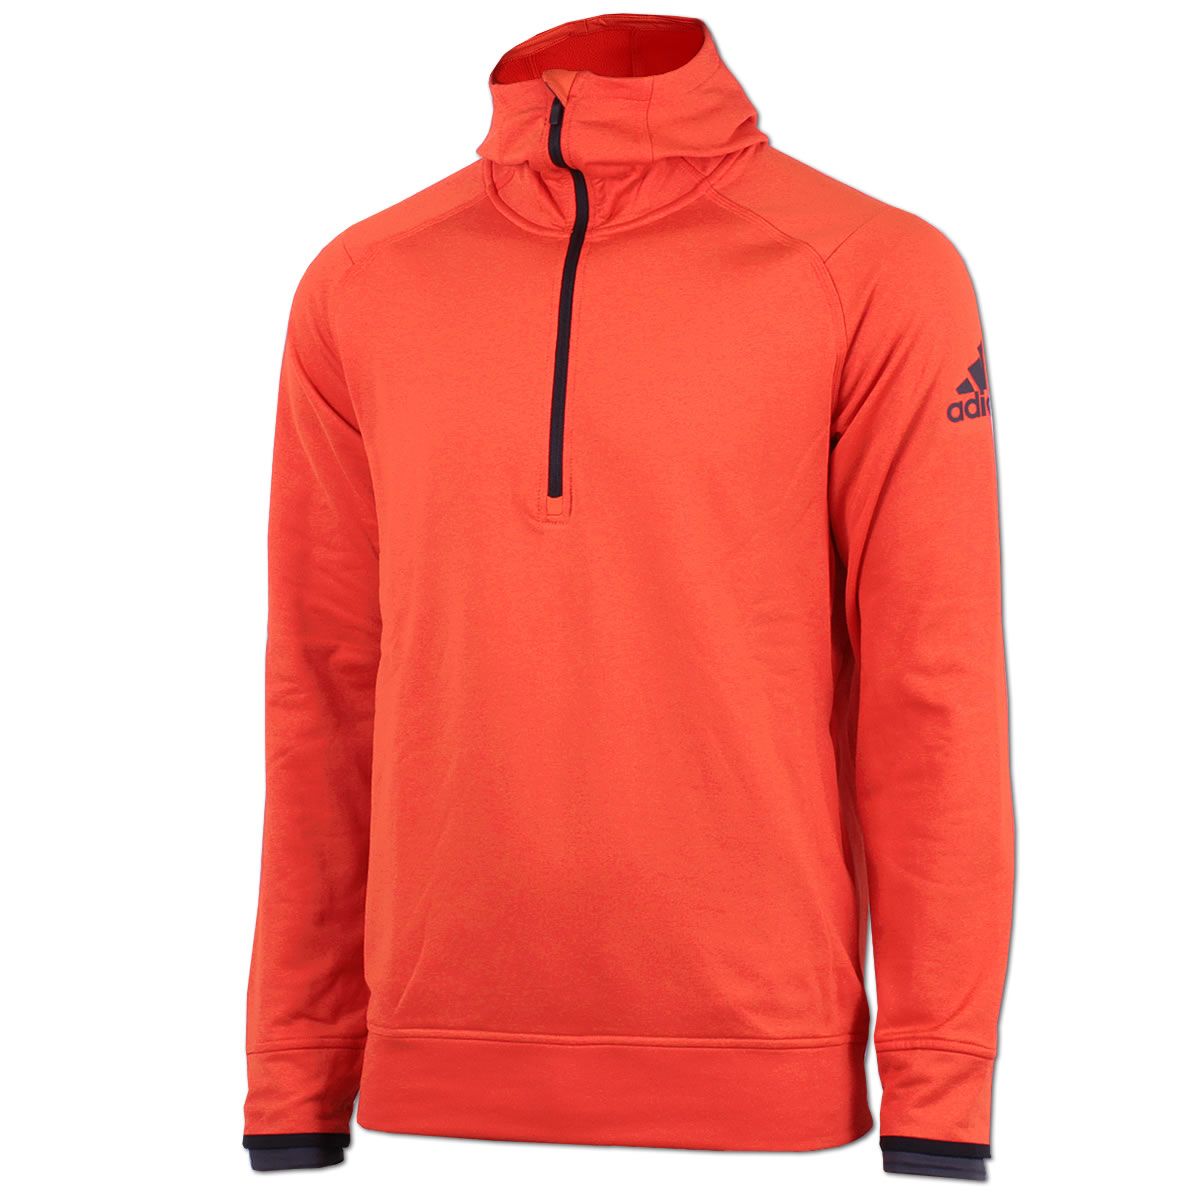 44ac59b27931 adidas Herren Kapuzensweat Climaheat Halfzip Hoody Polarfleece orange NEU